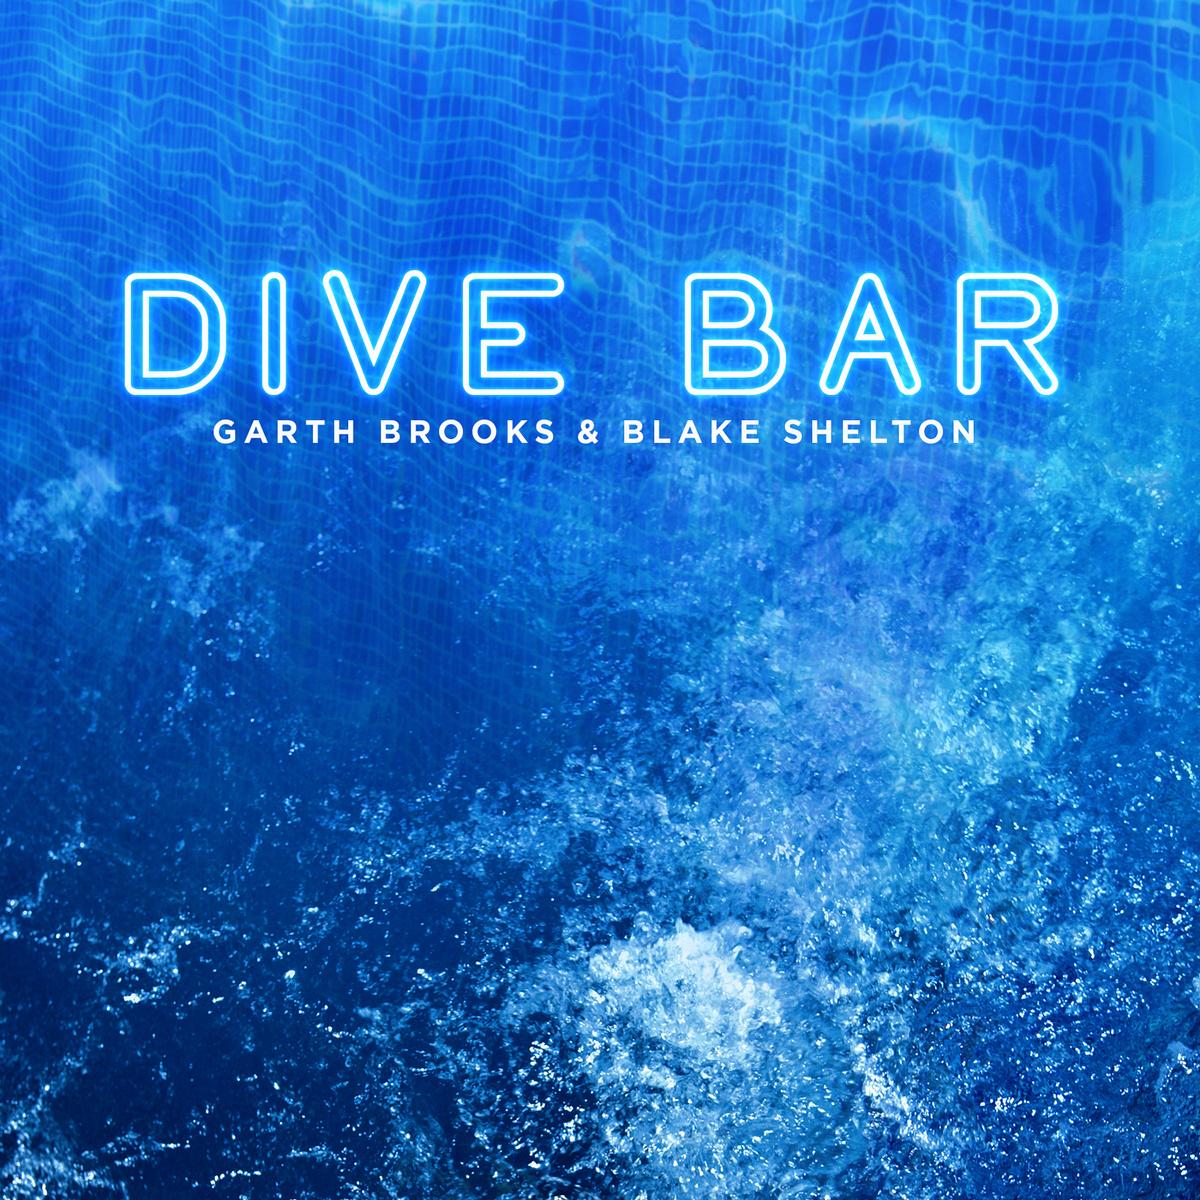 garth-brooks-blake-shelton-dive-bar